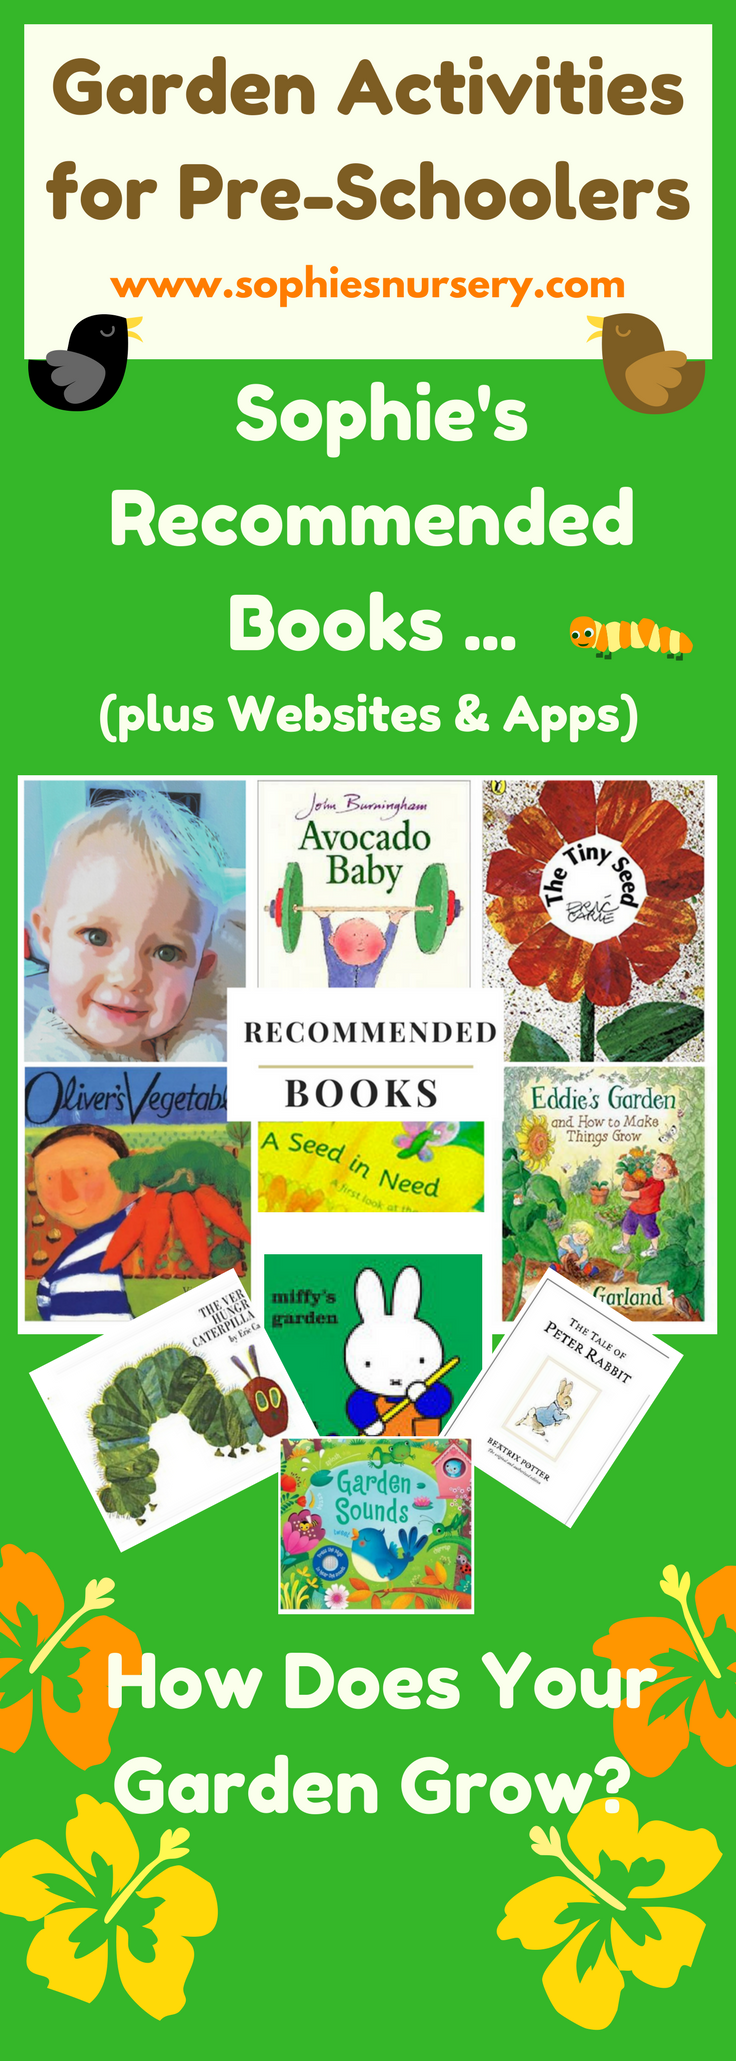 Gardening Books For Preschoolers Sophie 39 S Recommended Books Websites Apps Sophie 39 S Nursery